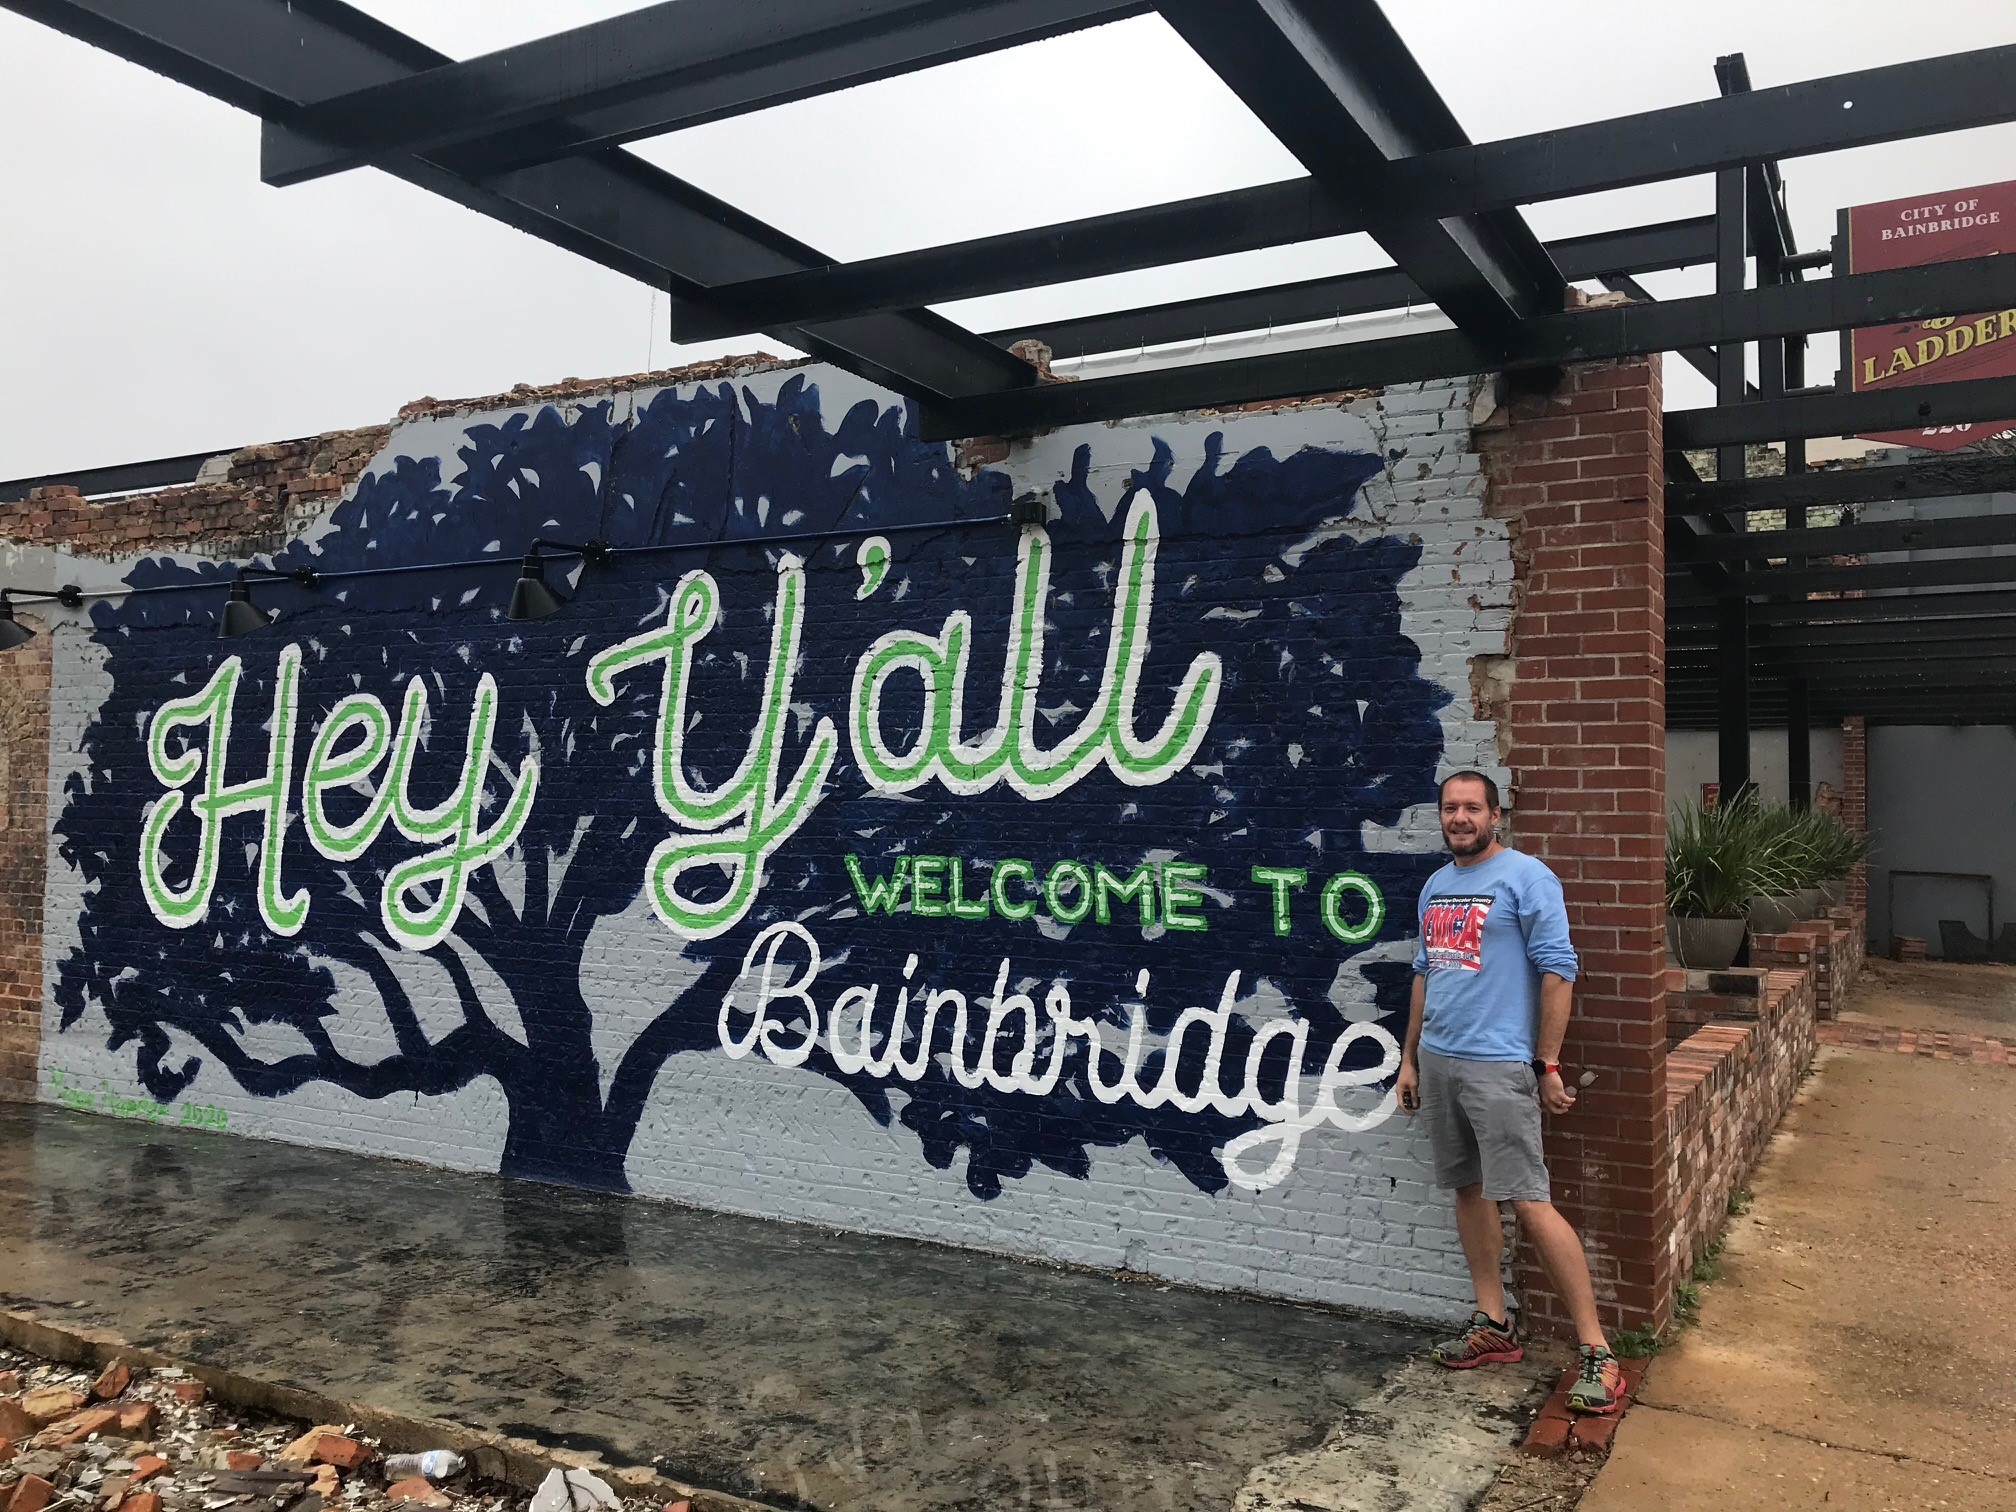 Hey Yall Mural